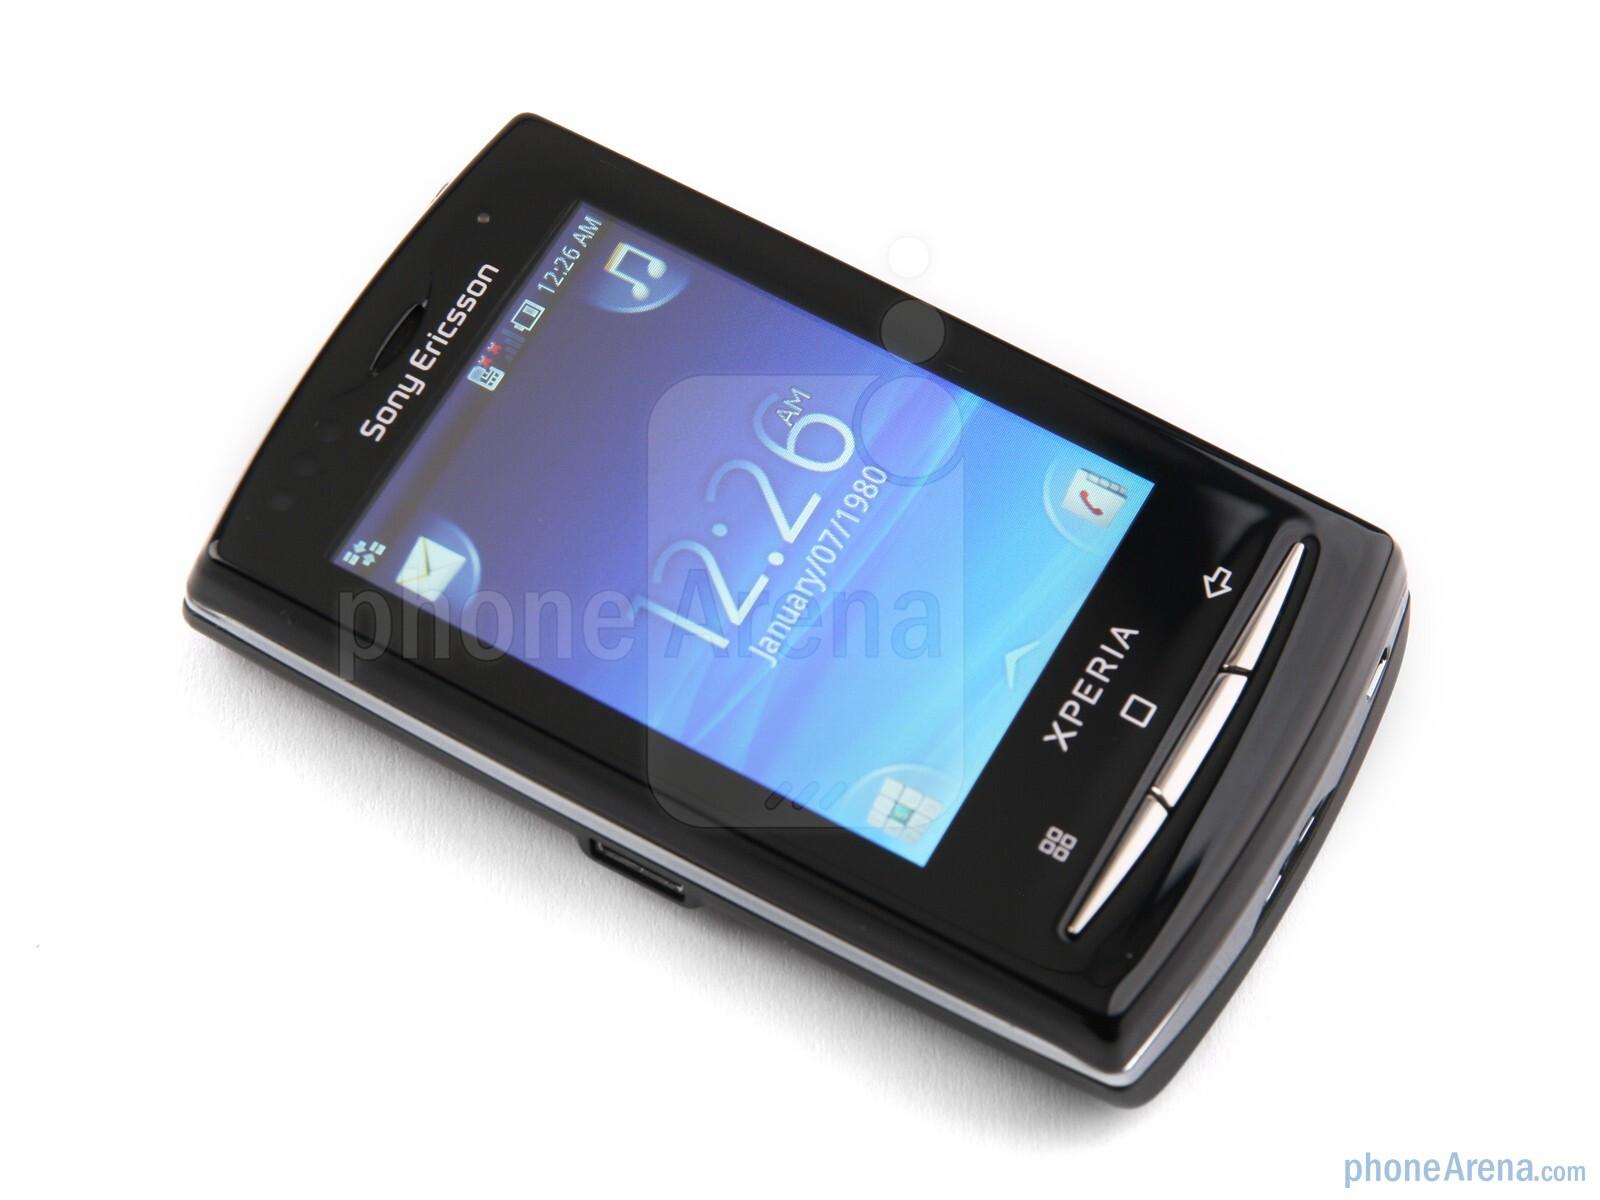 sony ericsson slide phone. sony ericsson slide phone 5